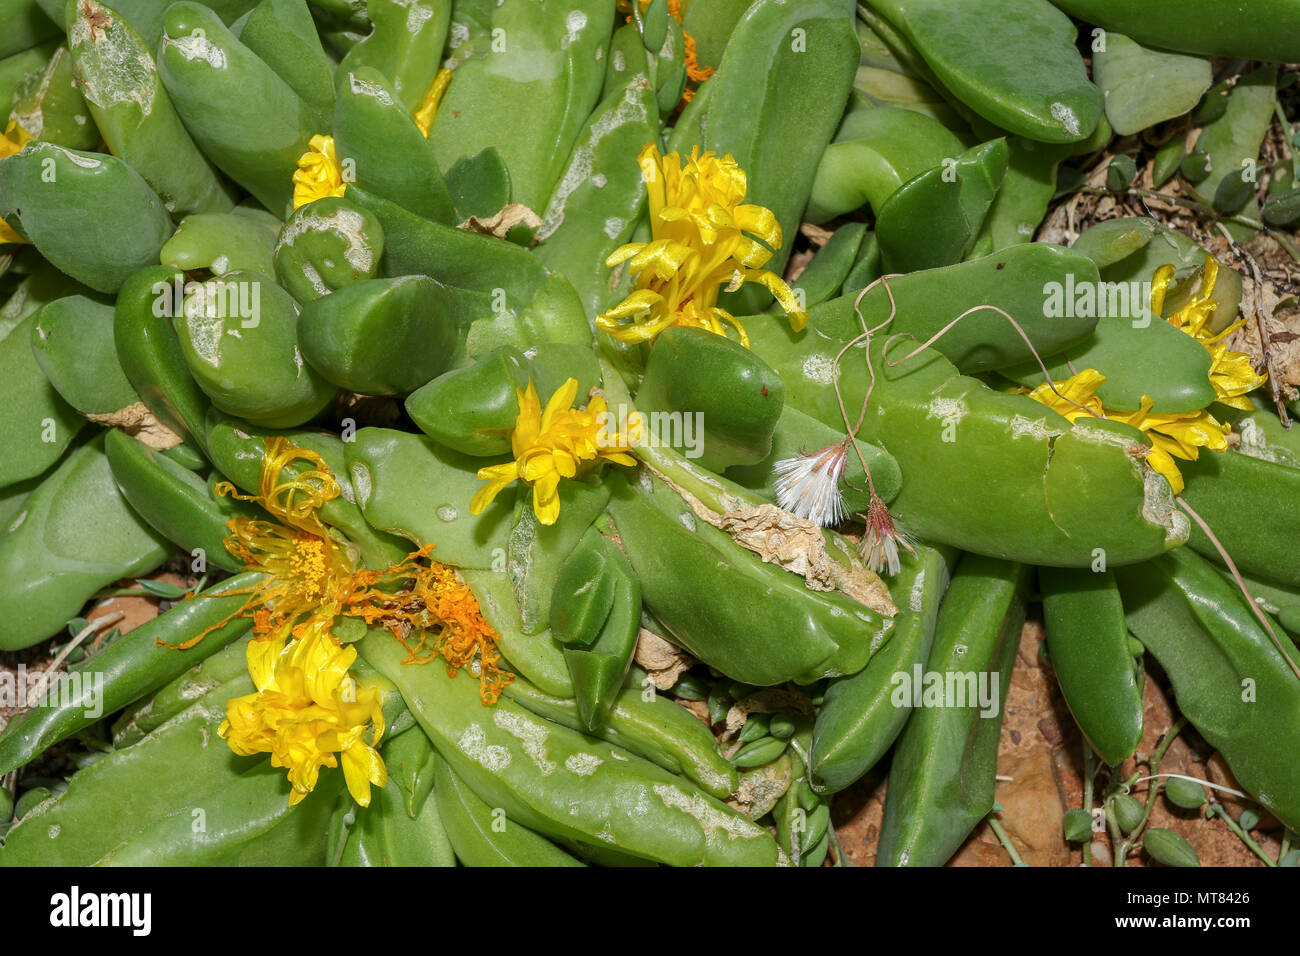 Glottiphyllum regium succulent in flower in the Kirstenbosch botanic garden, Cape town, South africa - Stock Image